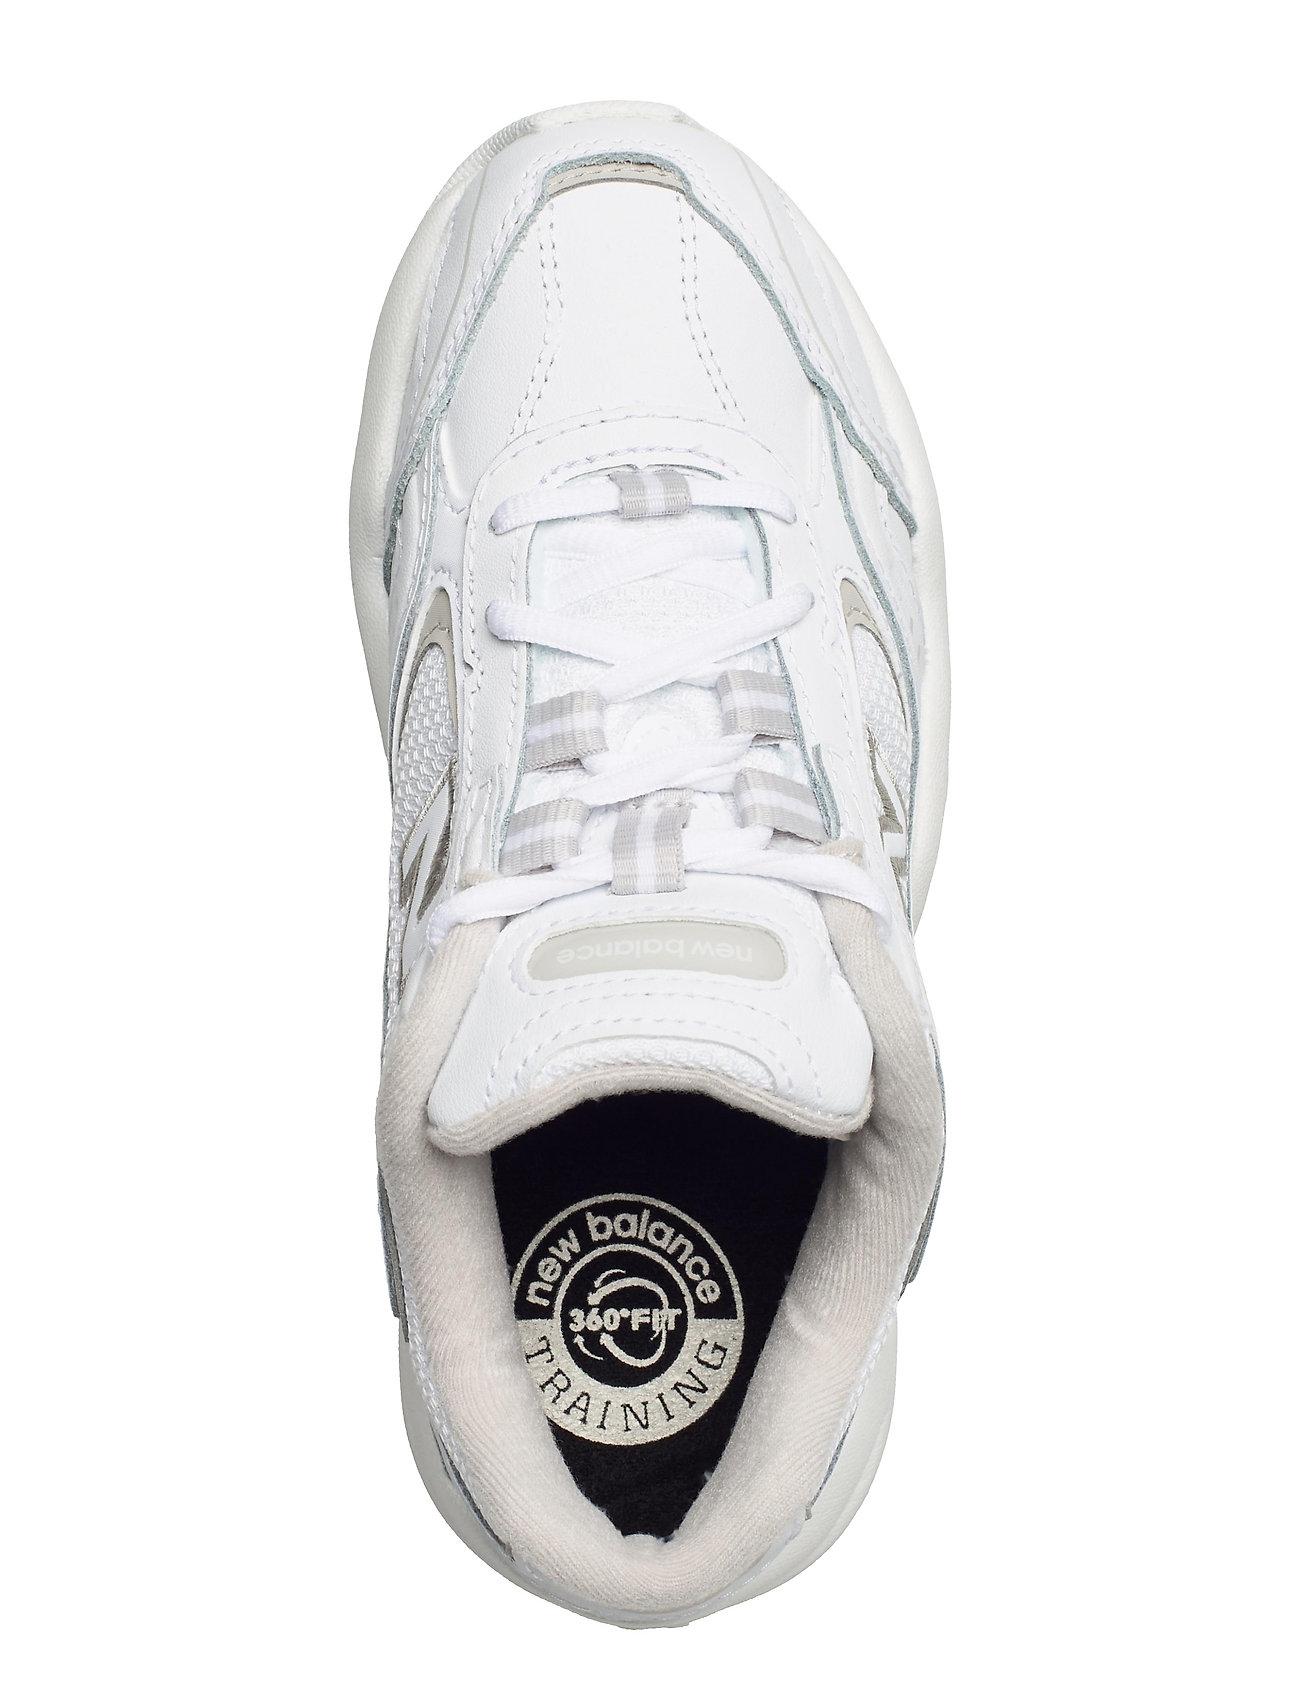 New Balance - WX452SG - white/grey - 8